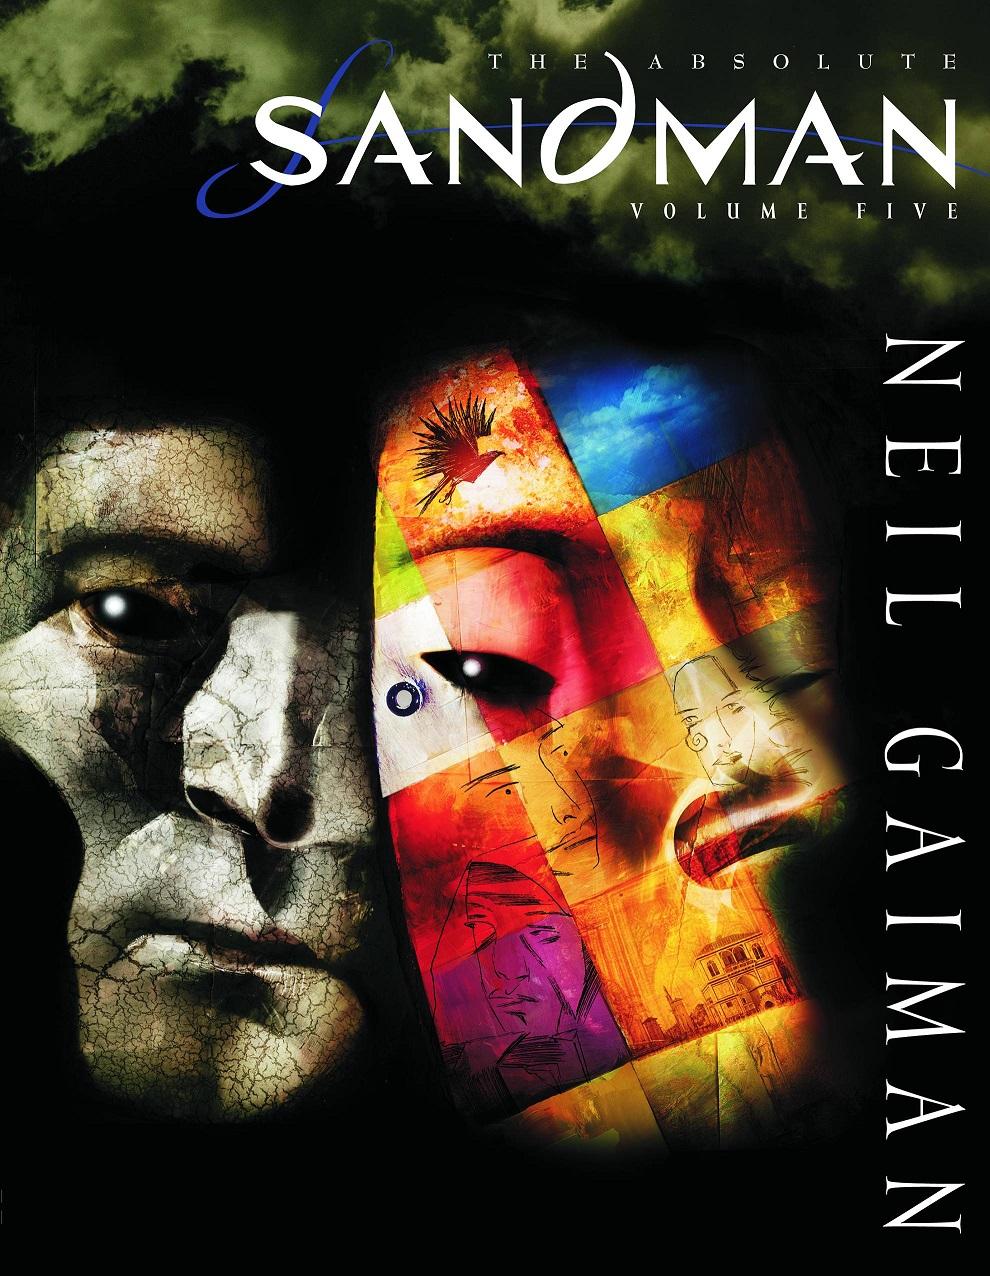 Sandman Delluxe Bog 5: Sandman Deluxe - Neil Gaiman - Bøger - RW Edizioni - 9788869718021 - 3/10-2016